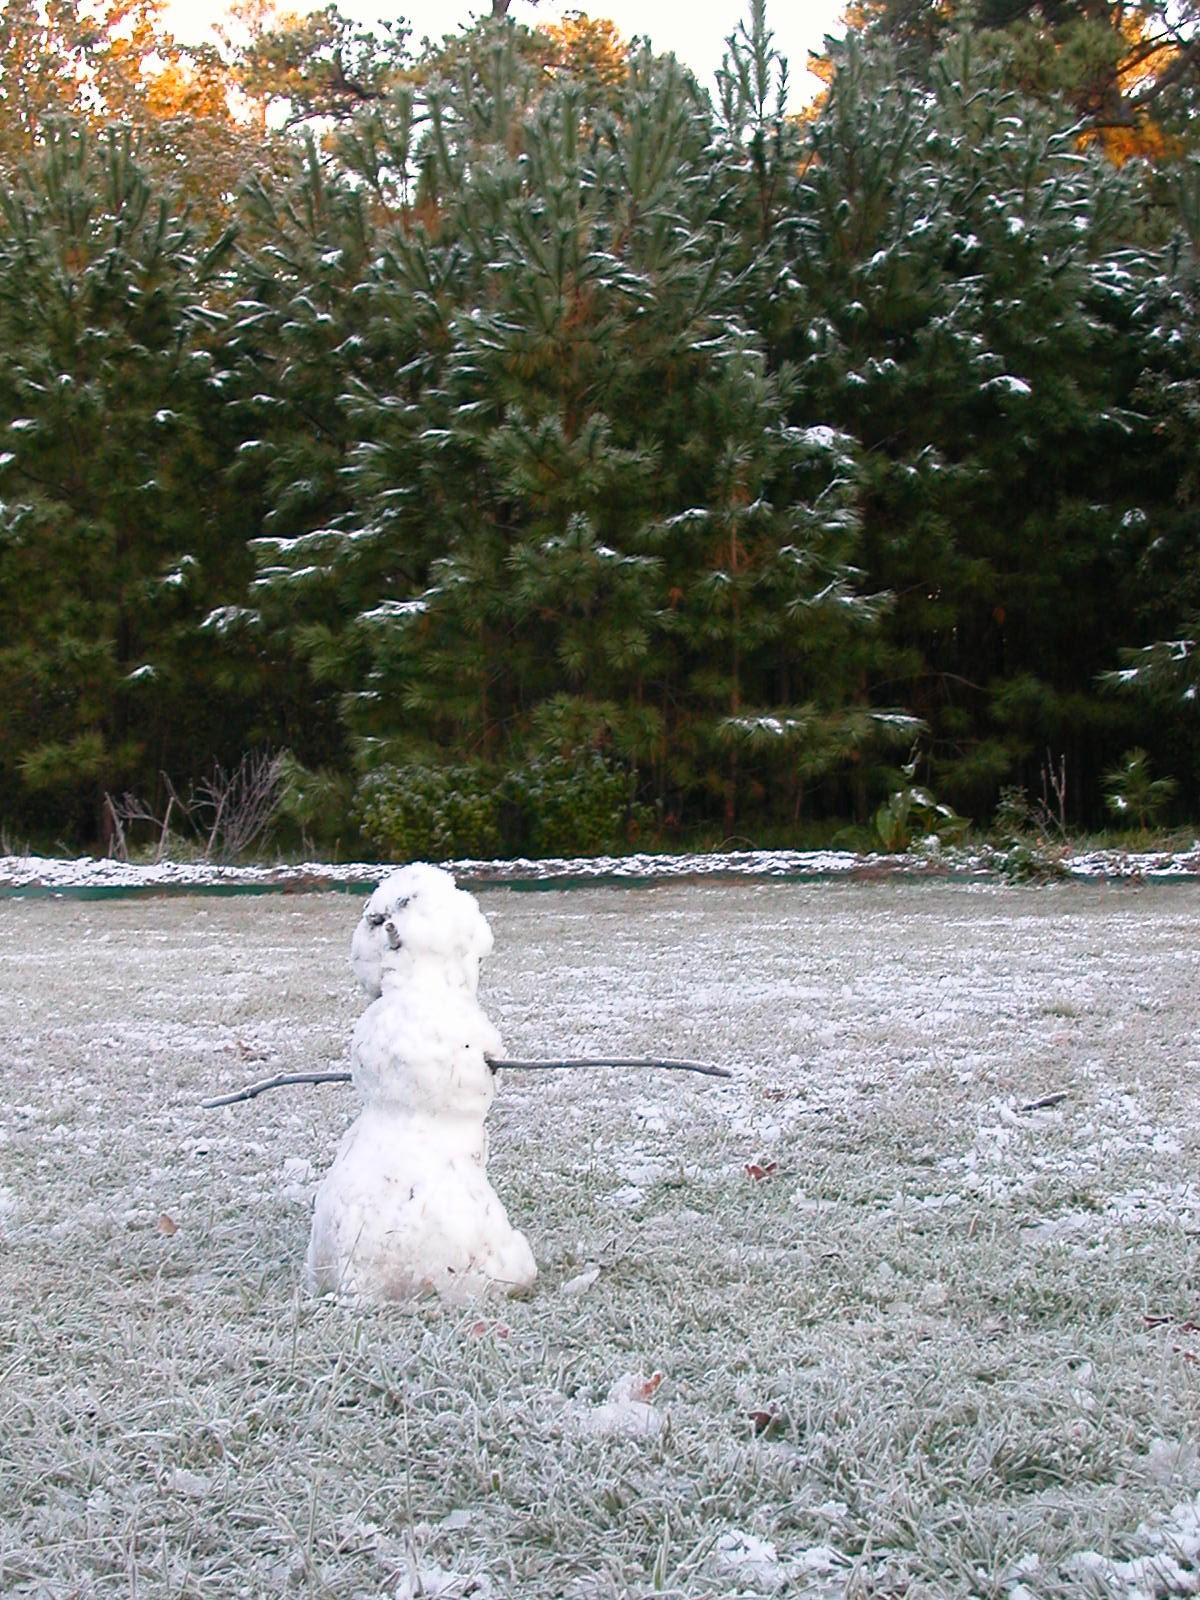 snowman-in-park-2009.jpg